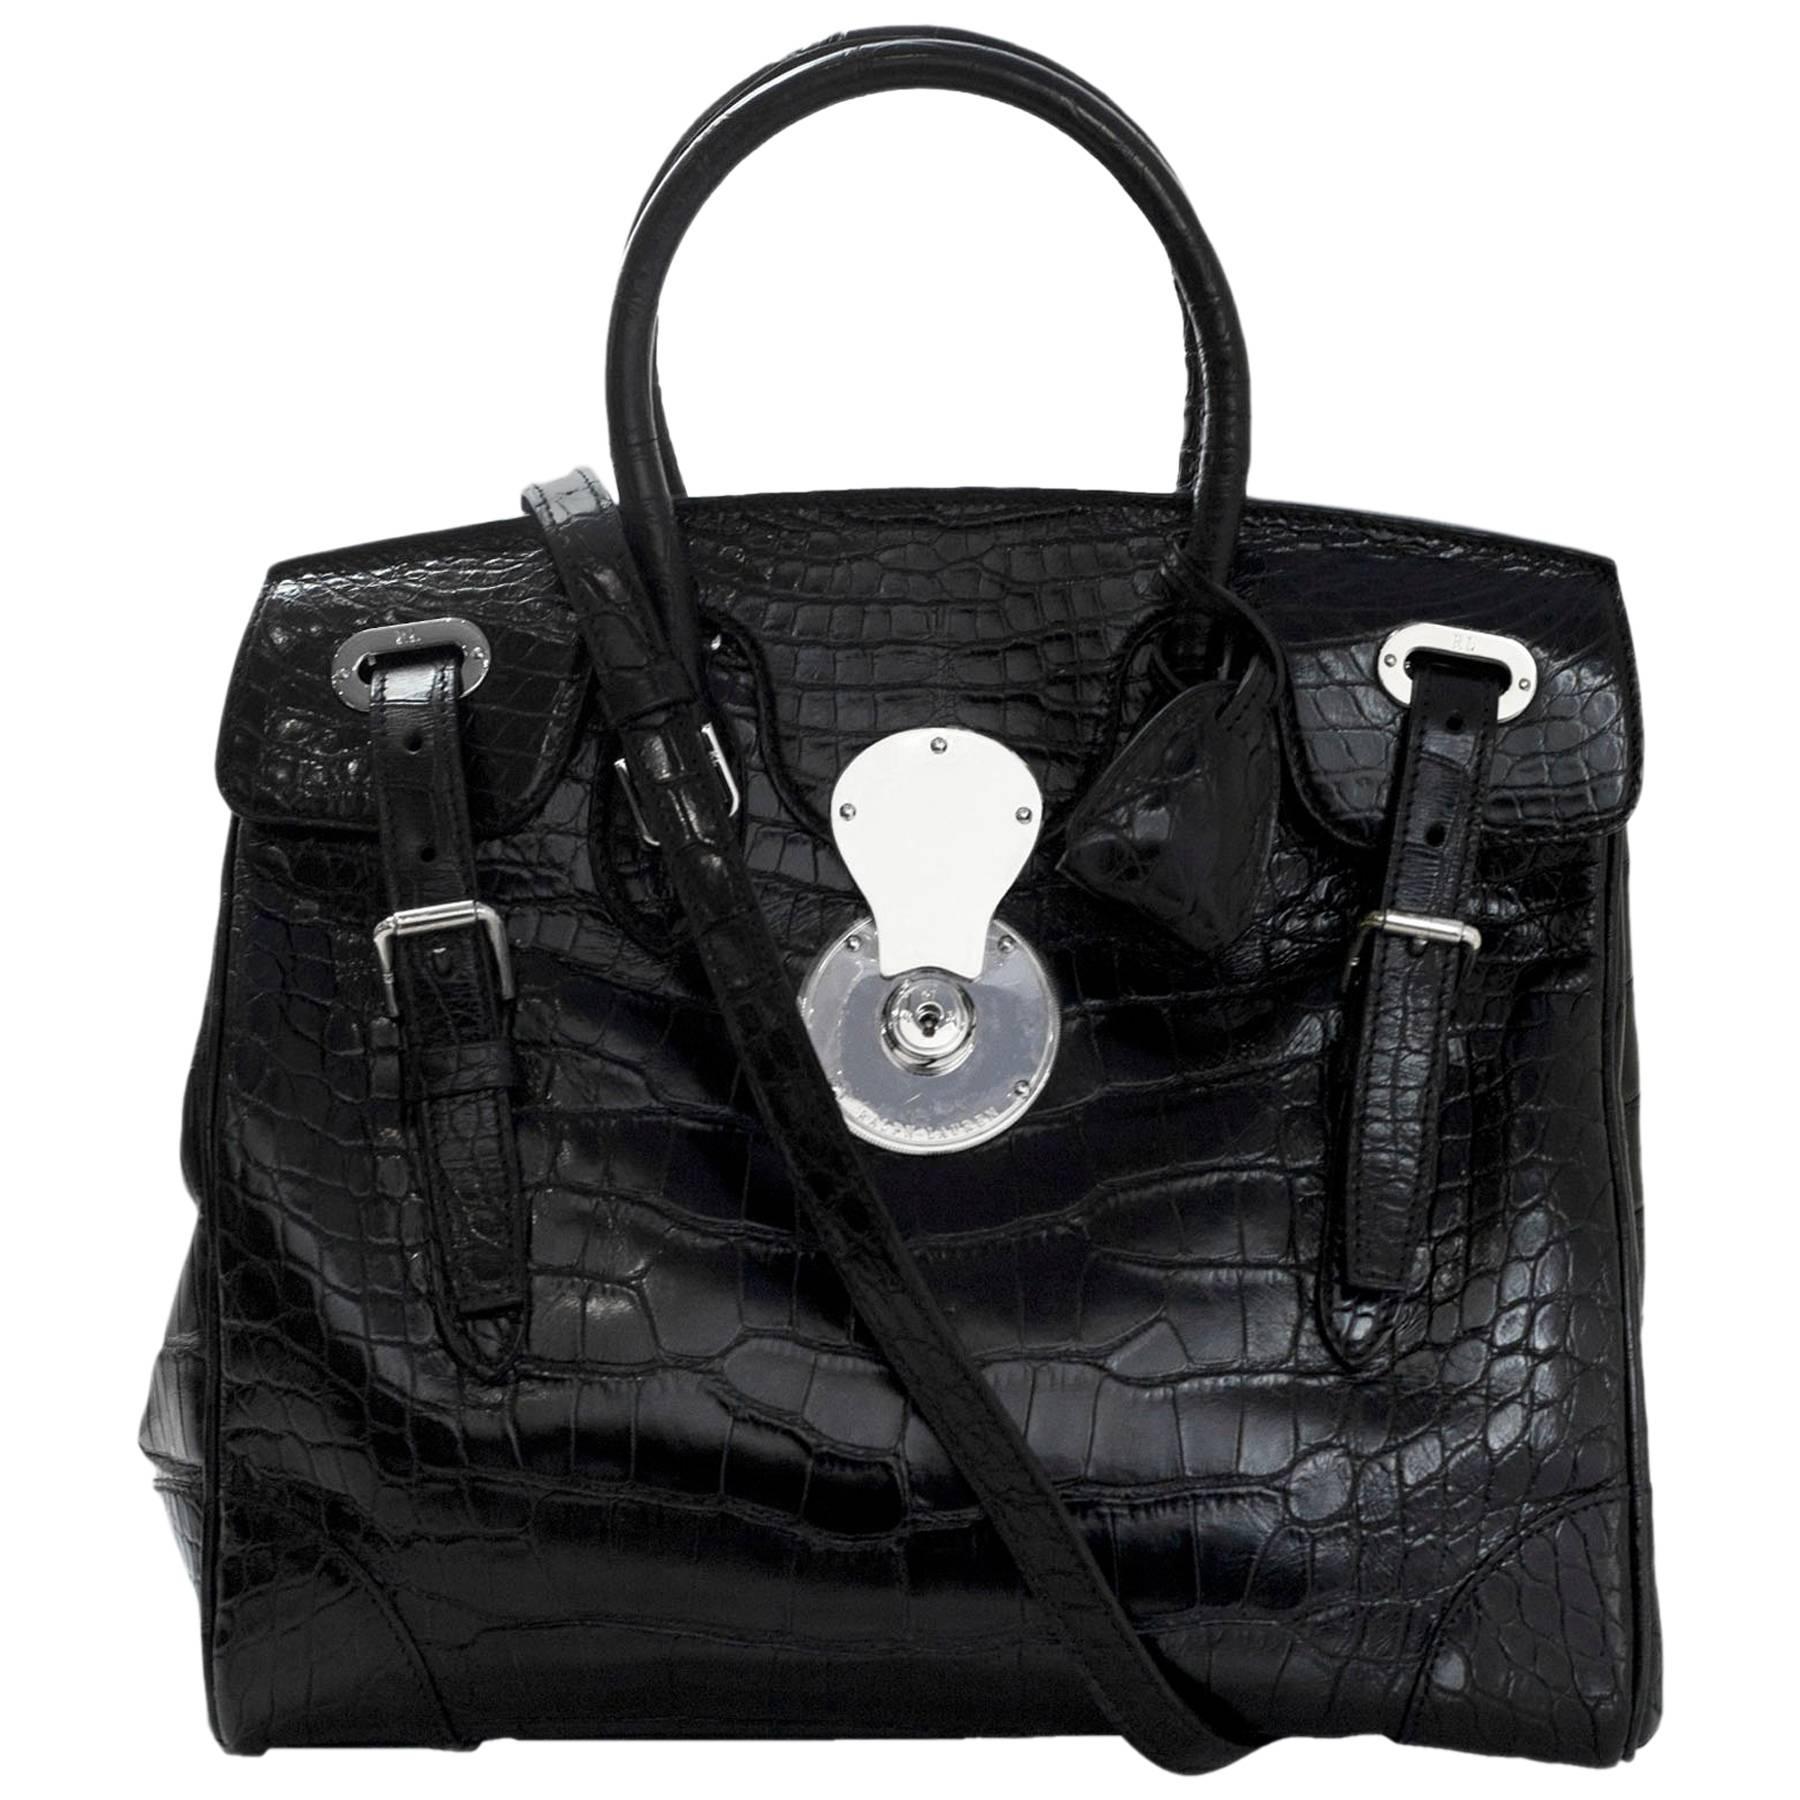 Ralph Lauren Black Crocodile Ricky 33 Satchel Bag with Strap